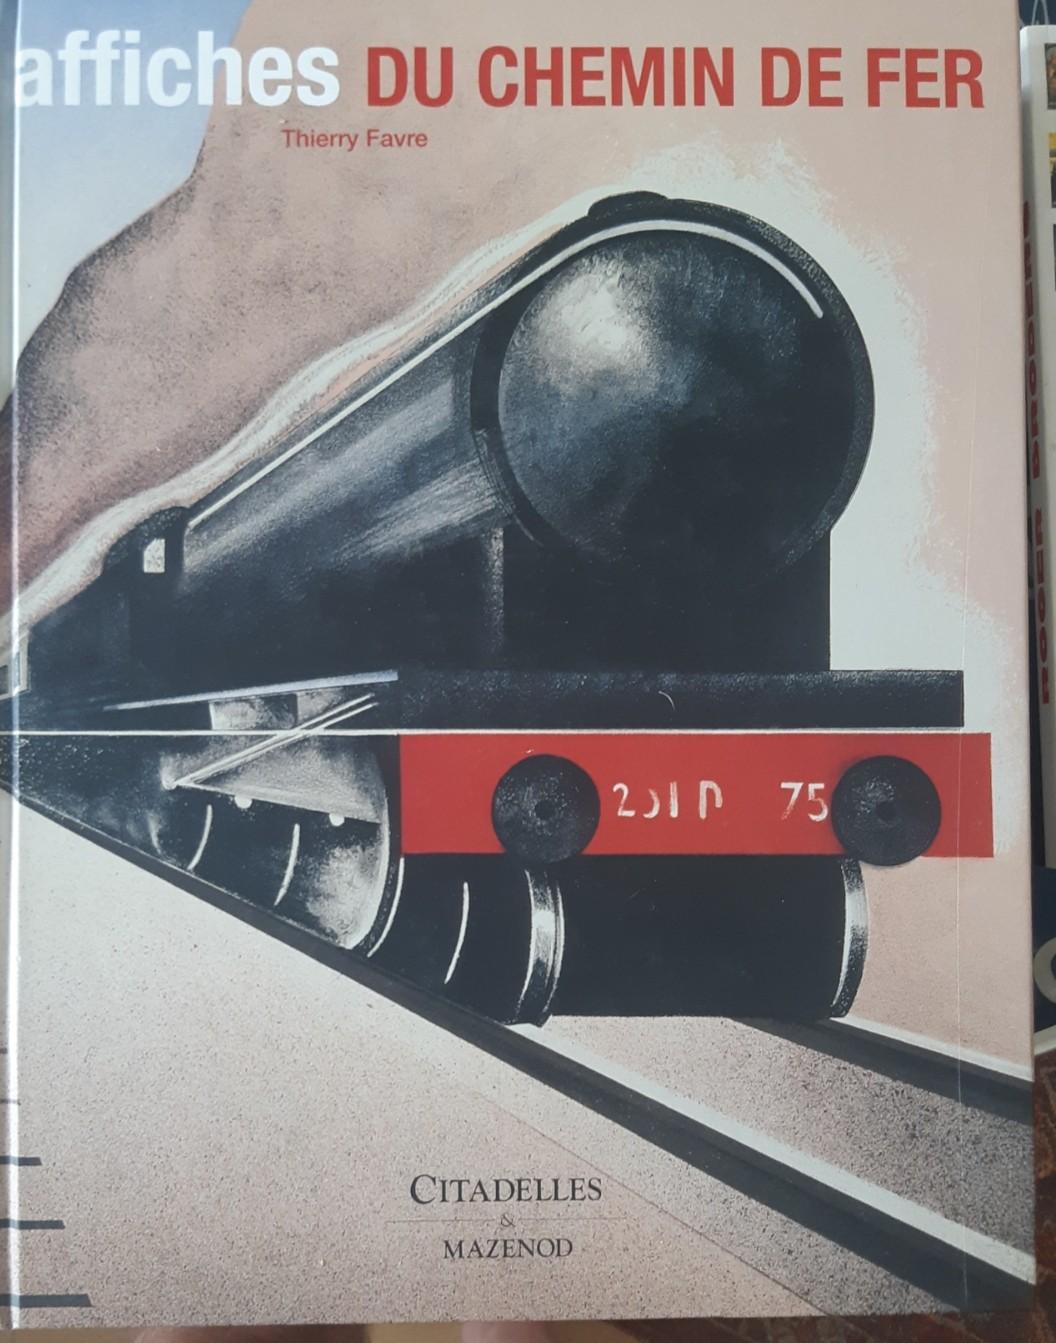 Edition beau livre citadelle mazenod fr